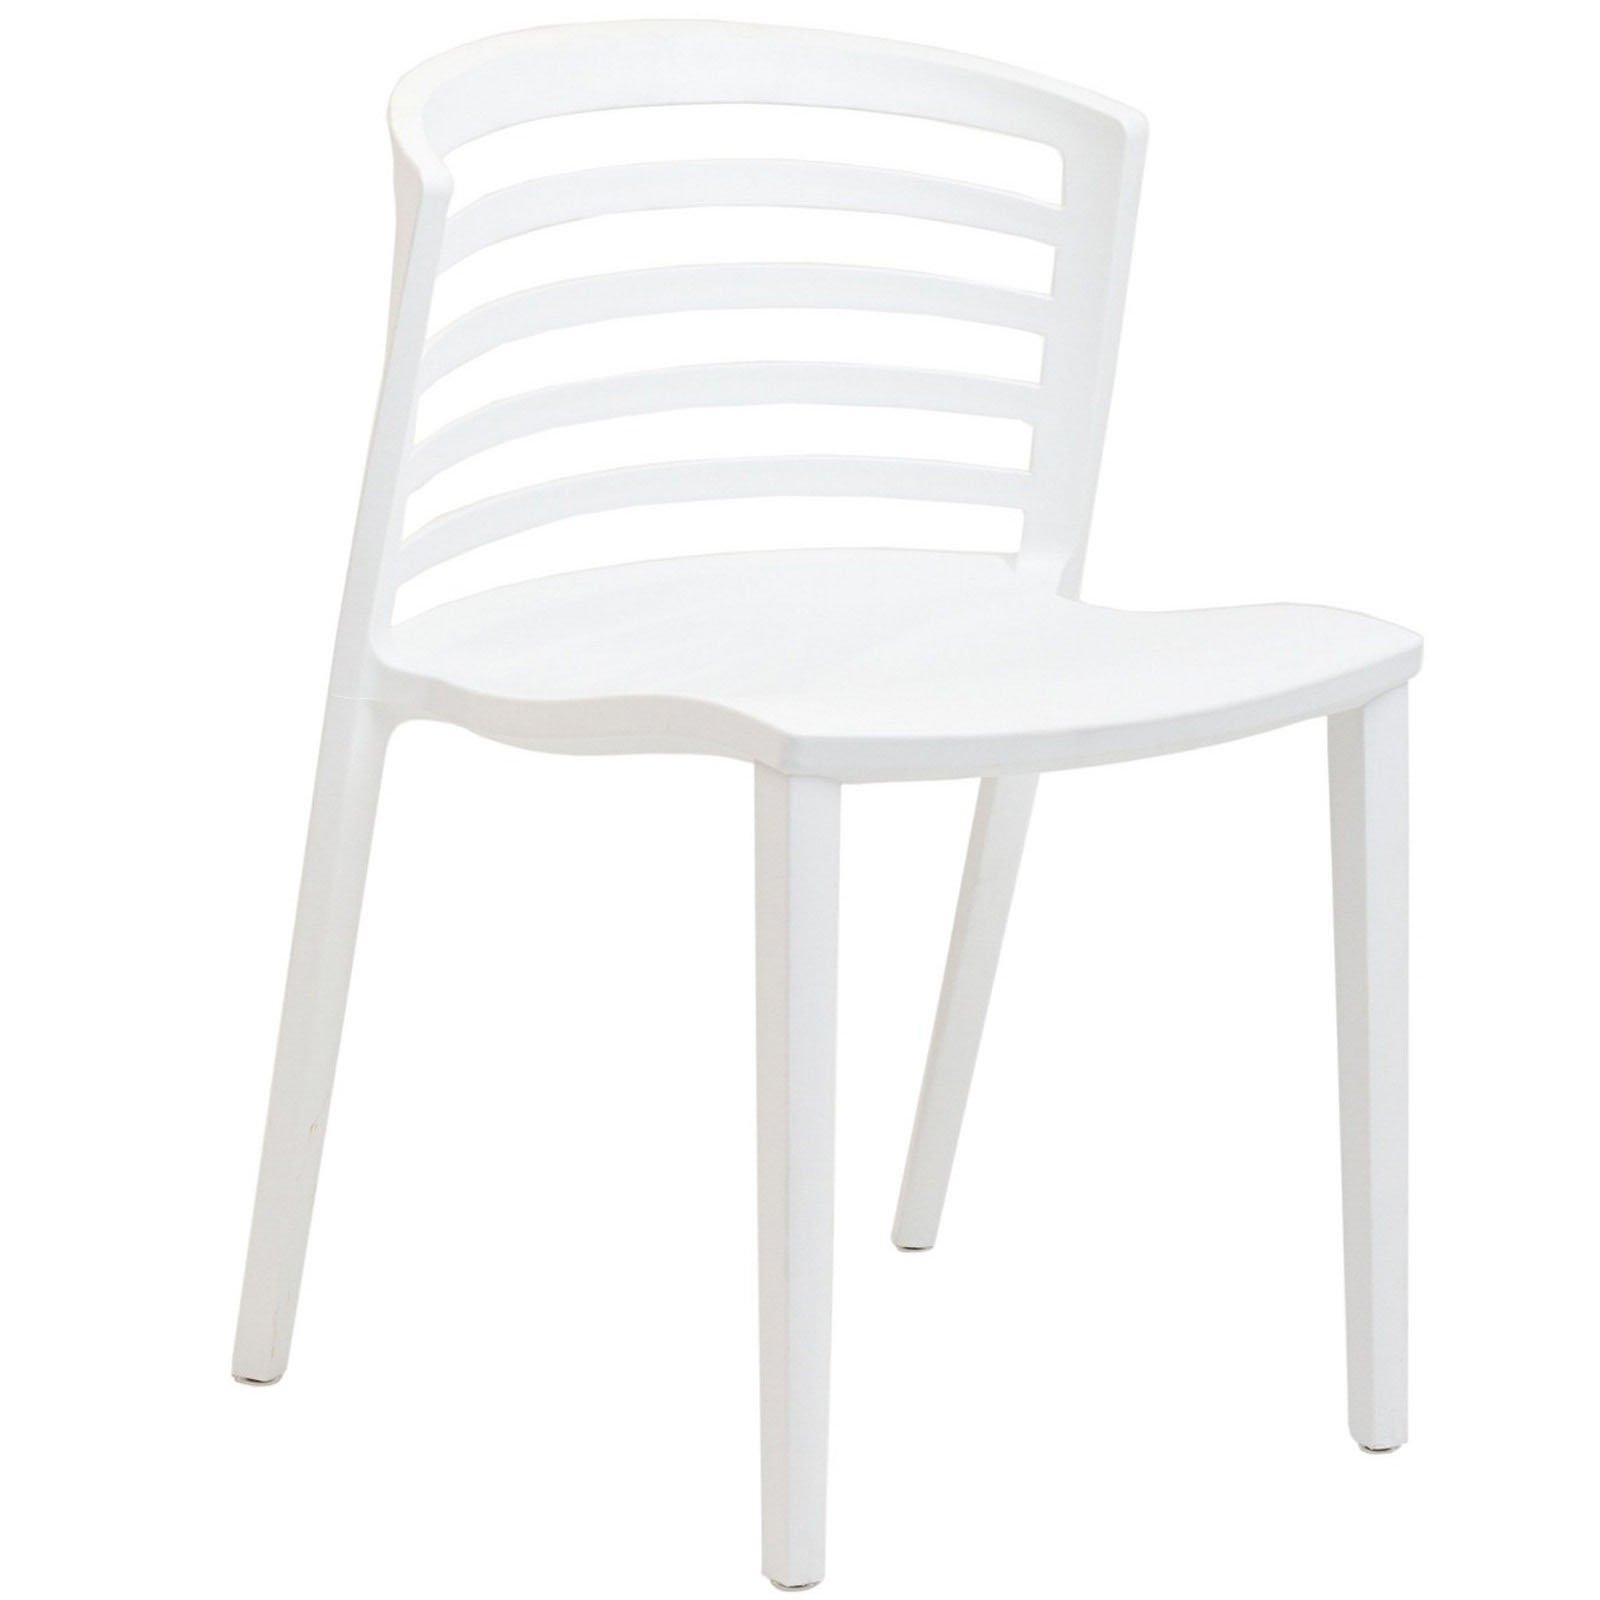 Modway Curvy Plastic Chair, White